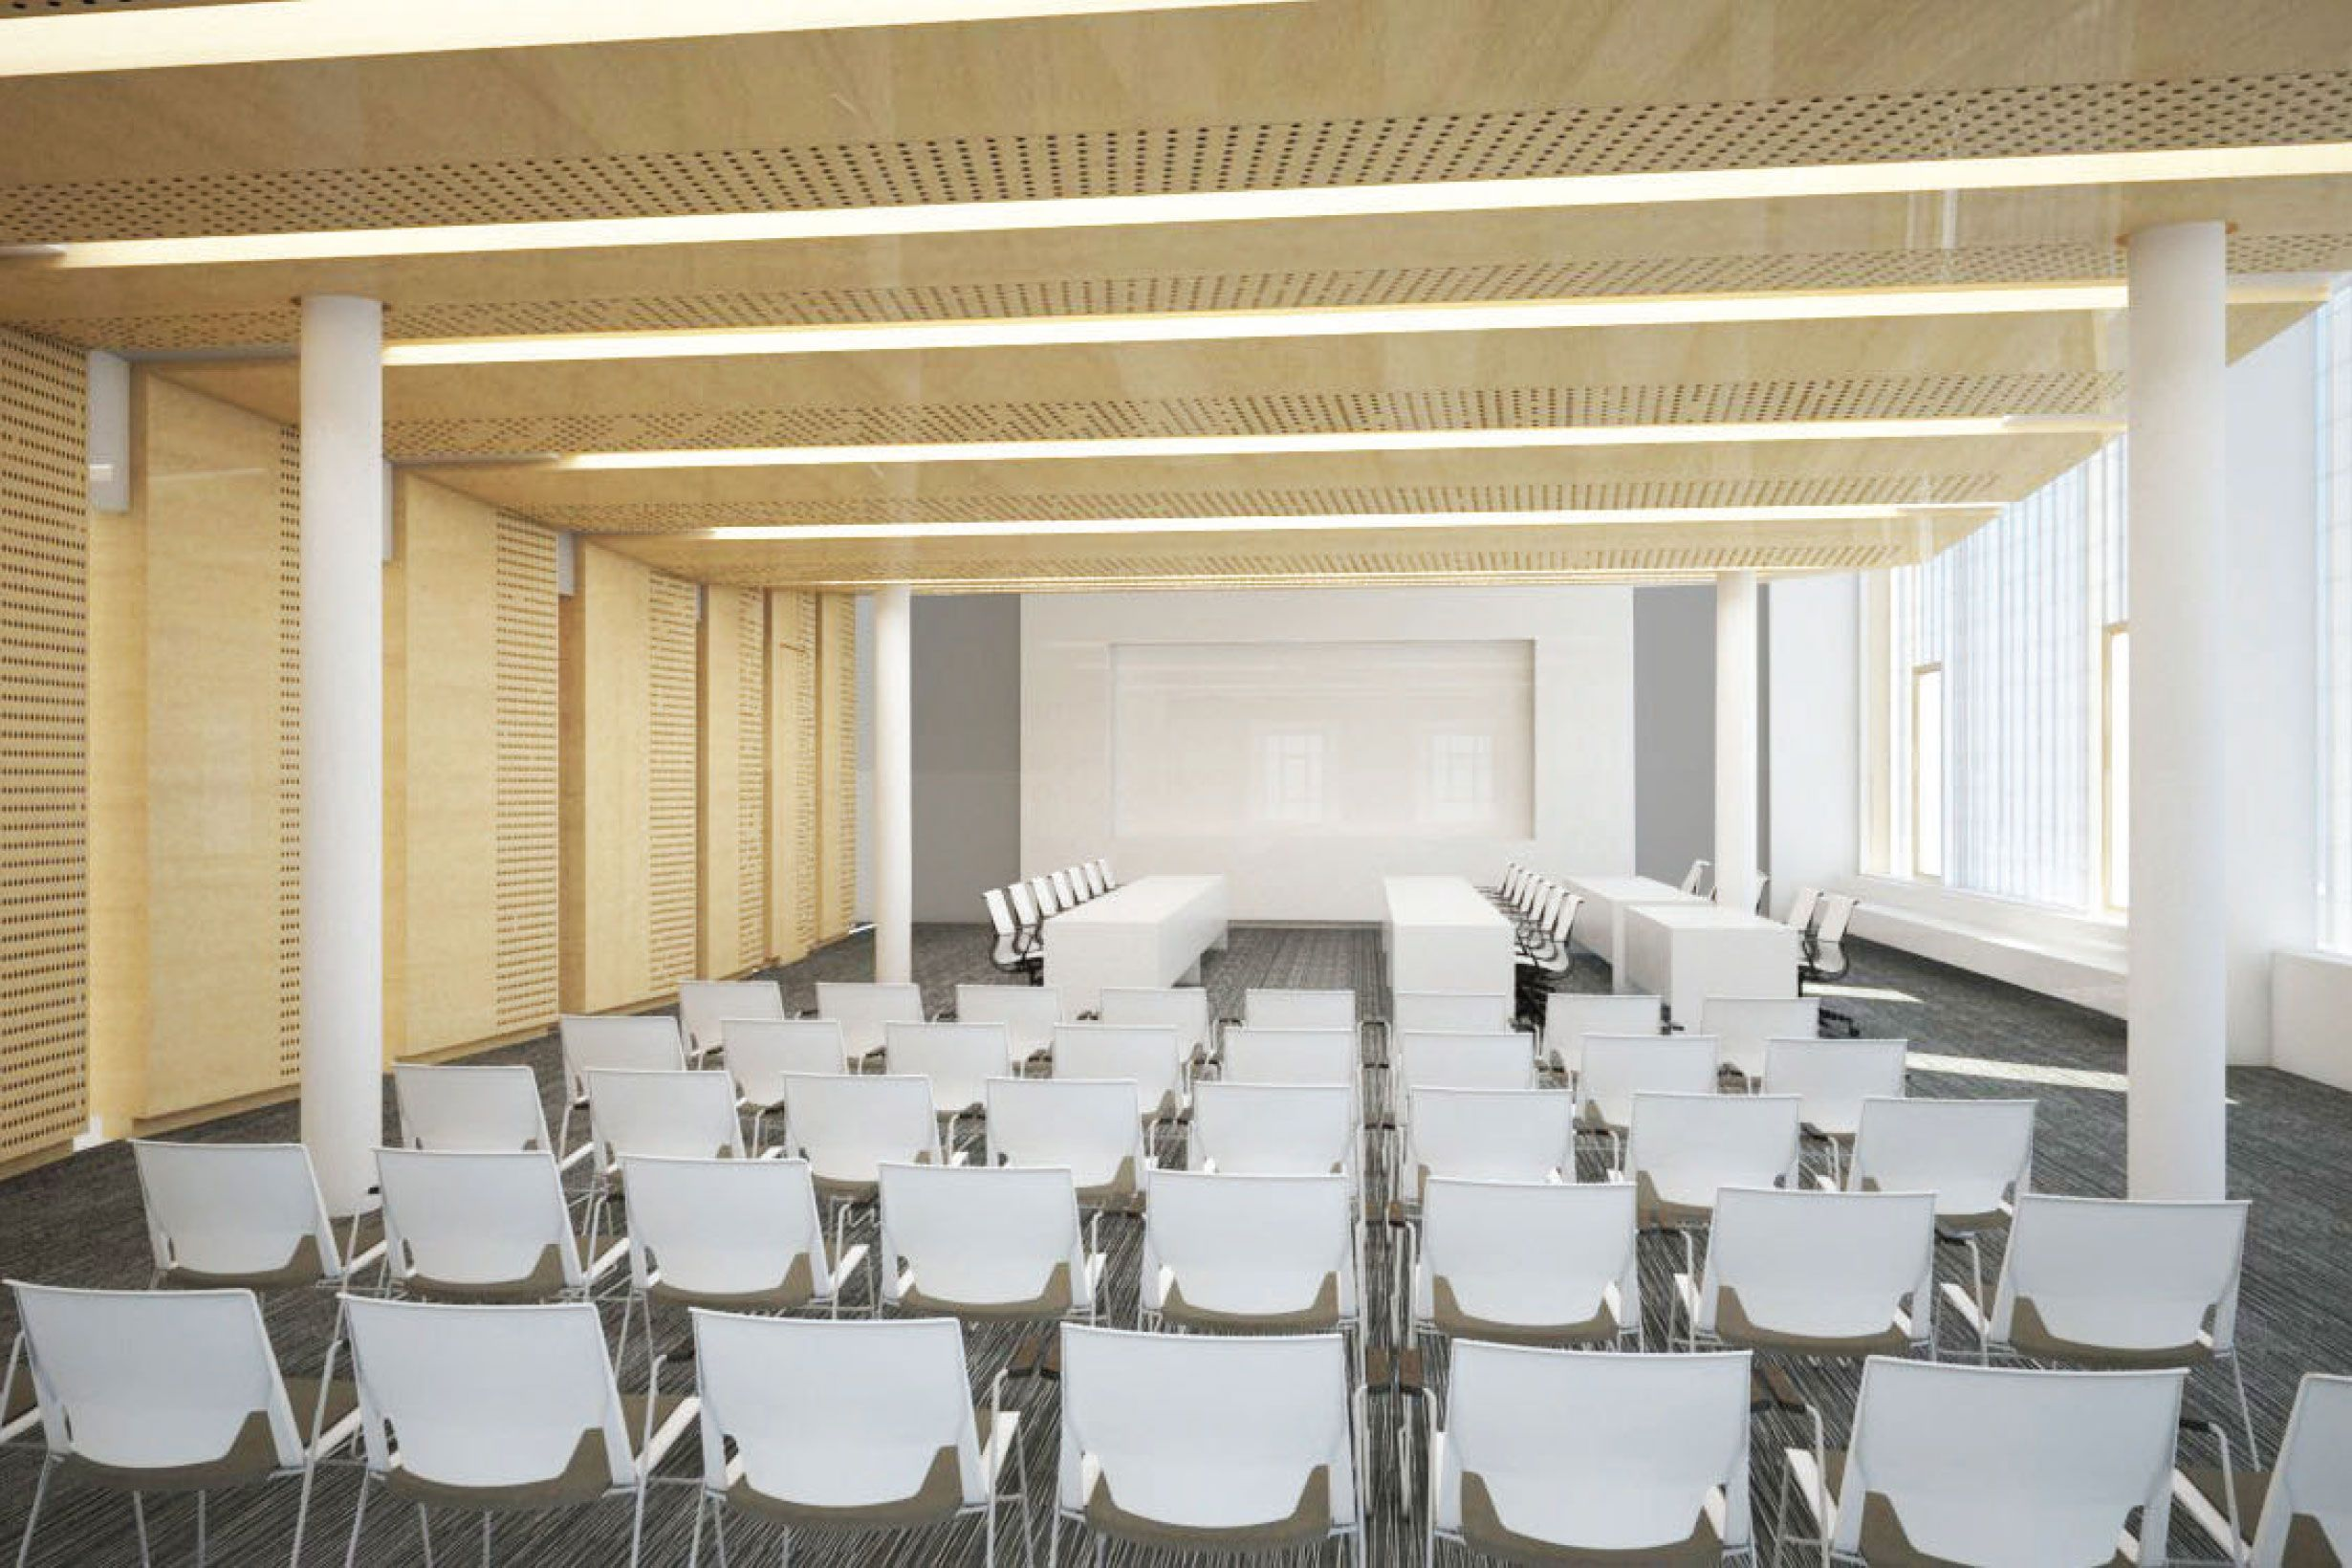 Planned Landmarks Preservation Commission hearing room